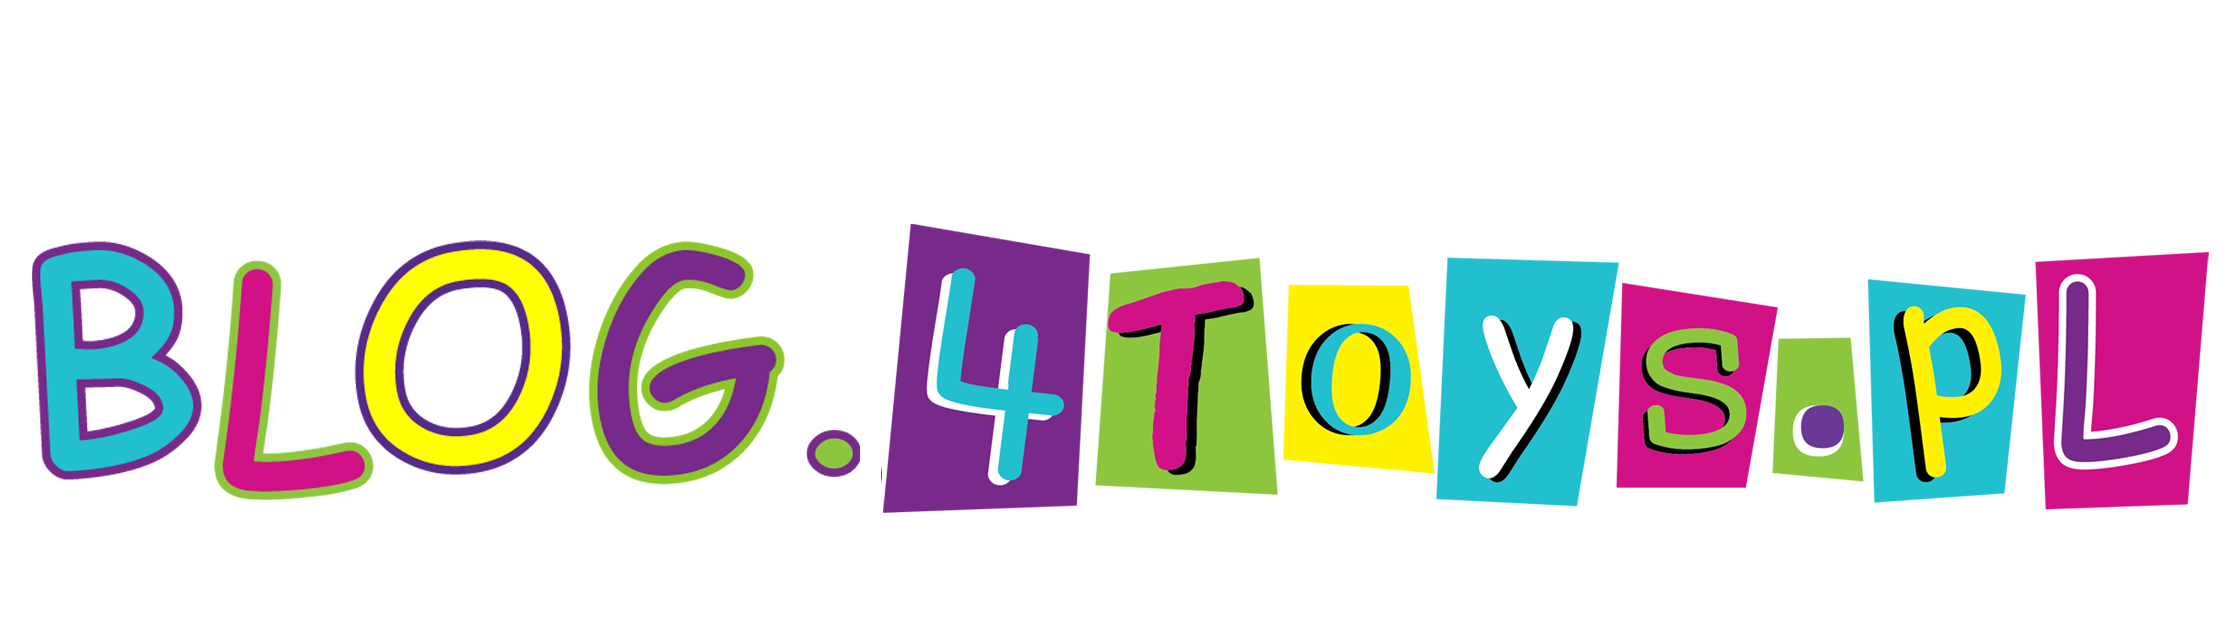 Blog 4toys.pl